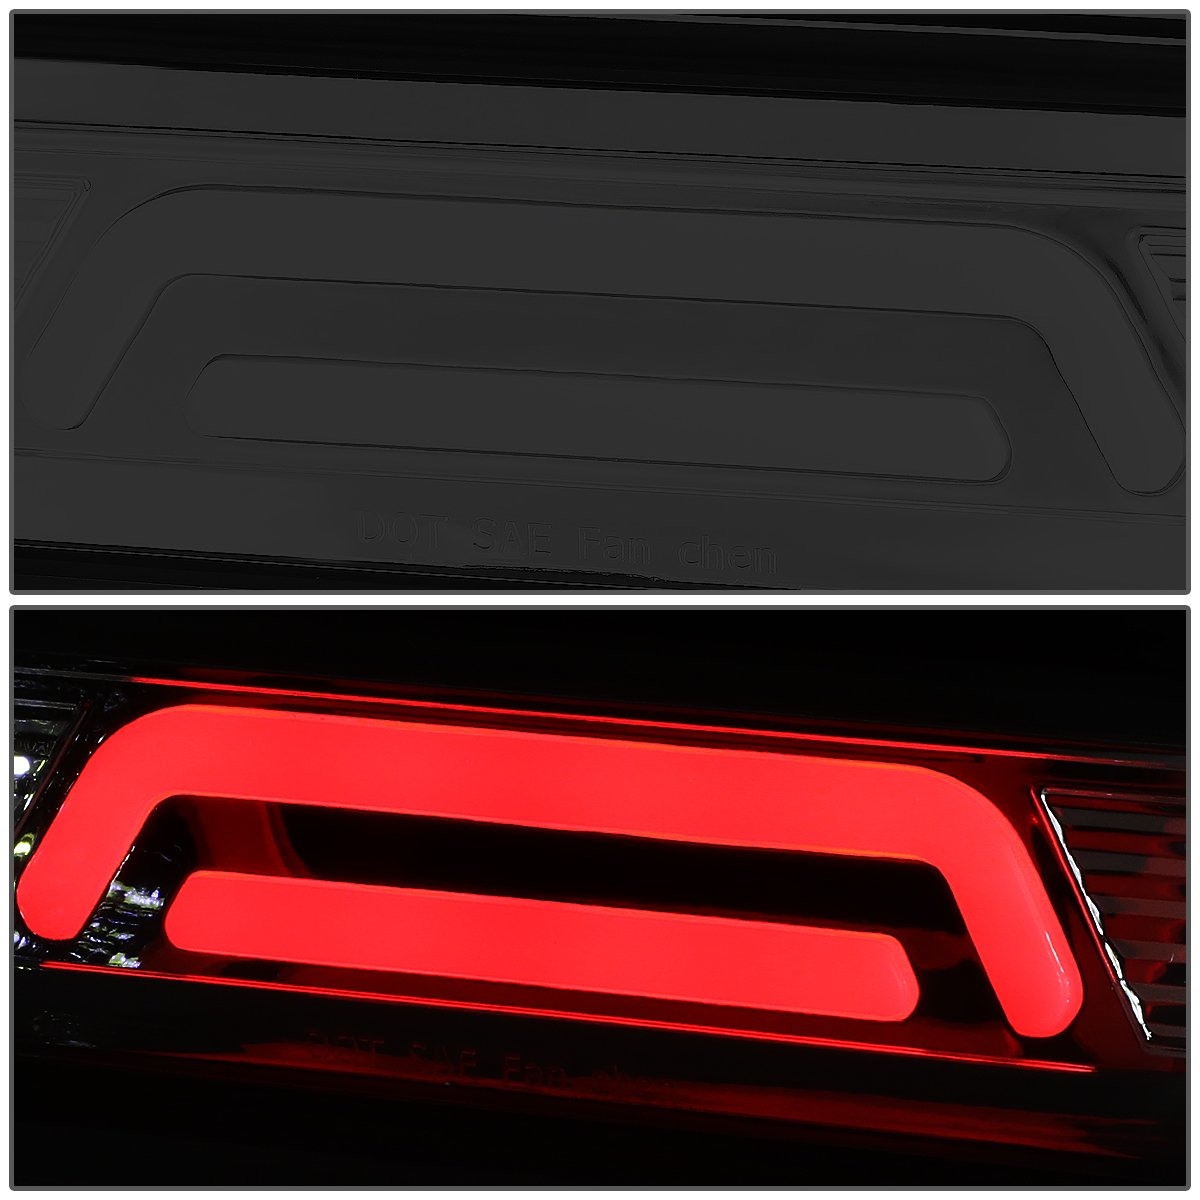 DNA Motoring 3BL-DRM02-3D-LED-SM 3D LED Bar Third Brake//Cargo Light Chrome//Smoked 02-09 Dodge Ram Truck